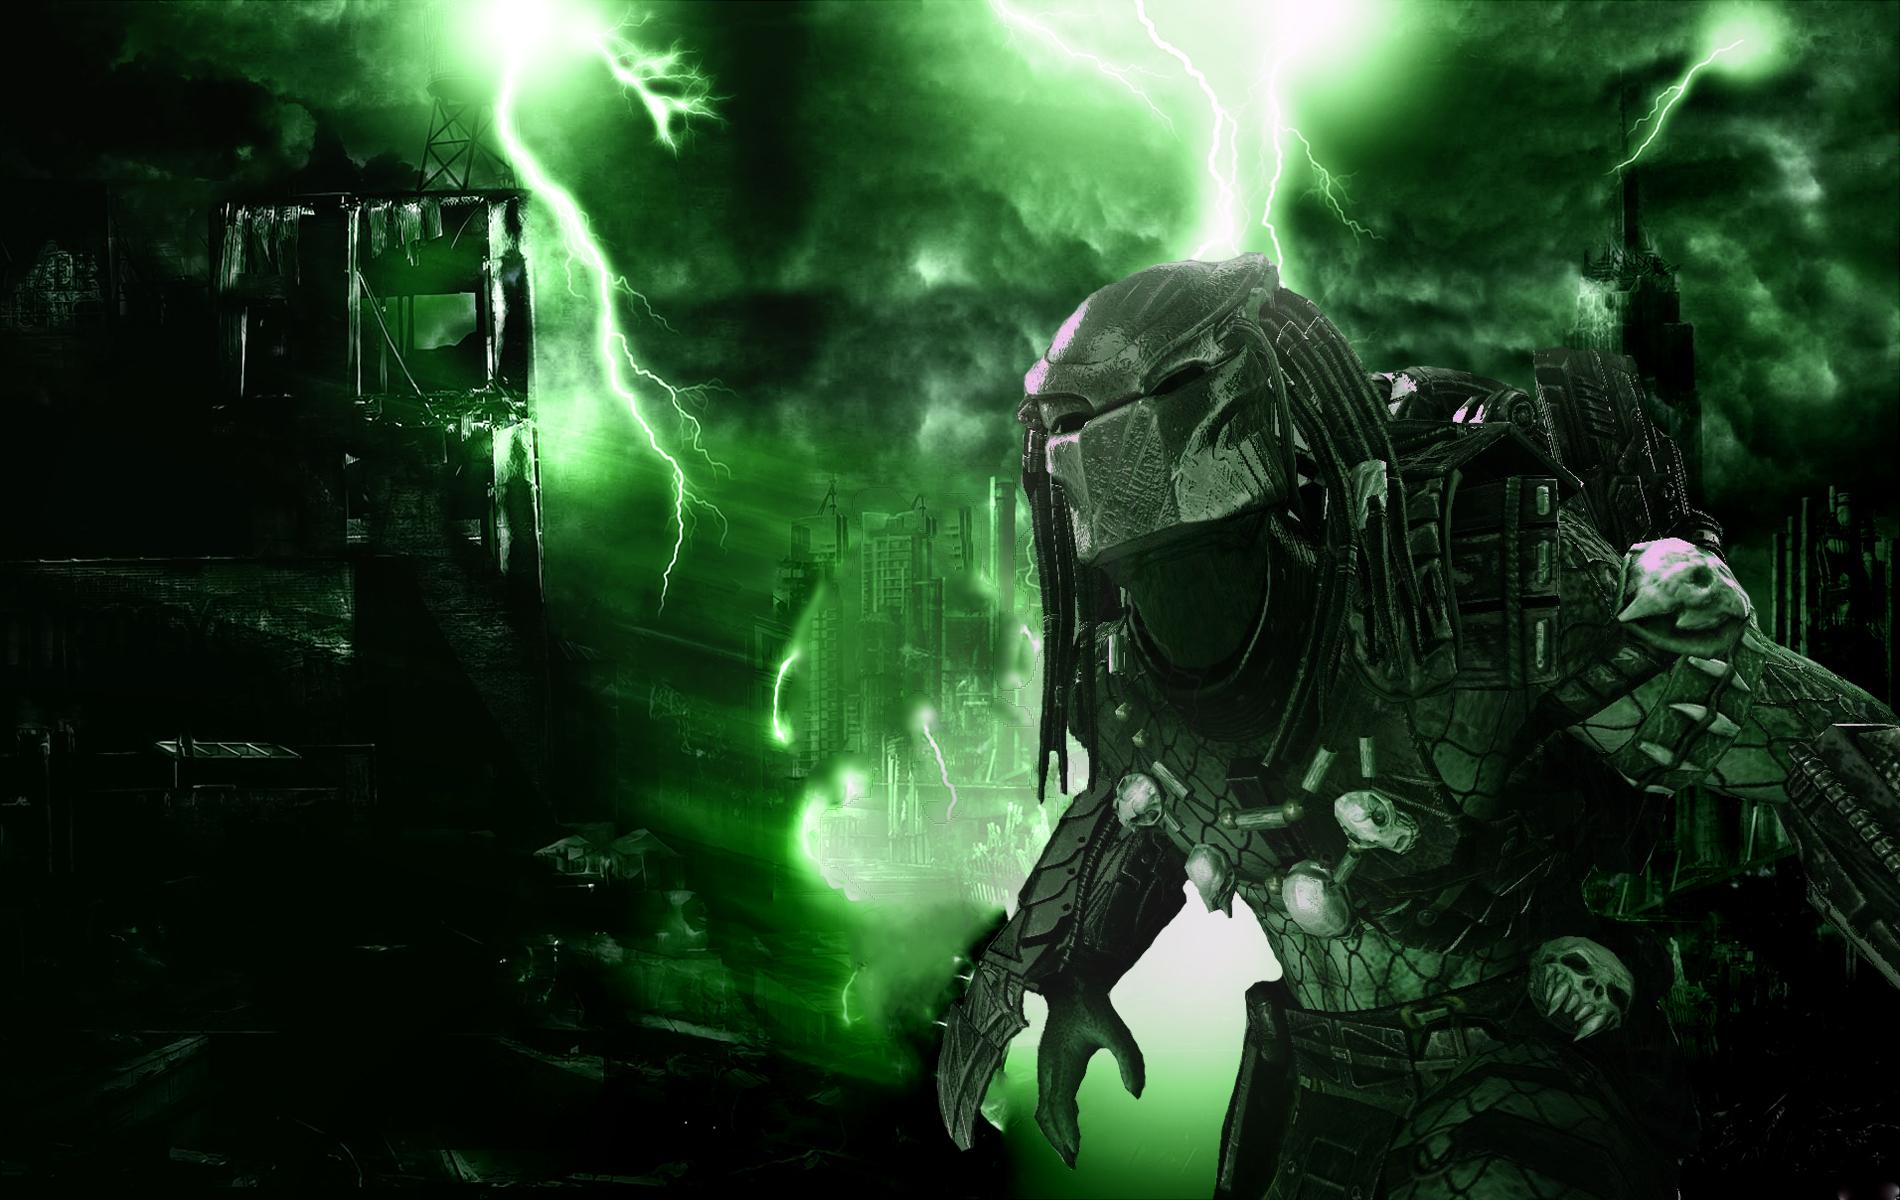 Download Movie Predator Wallpaper 1900x1200 Wallpoper 211727 1900x1200